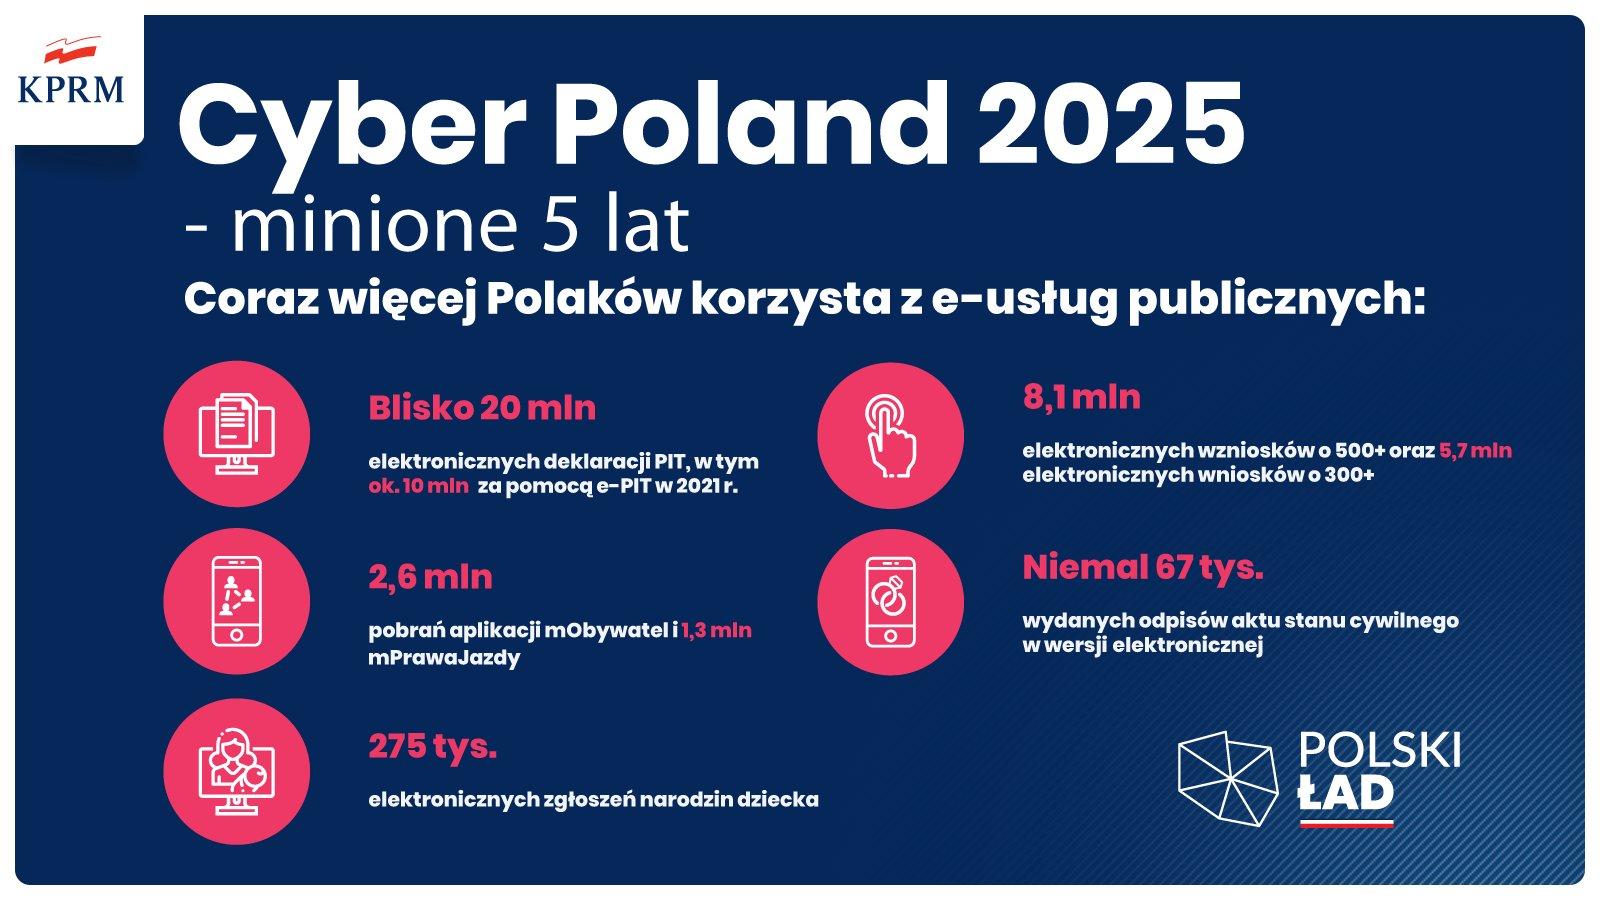 Cyber Poland